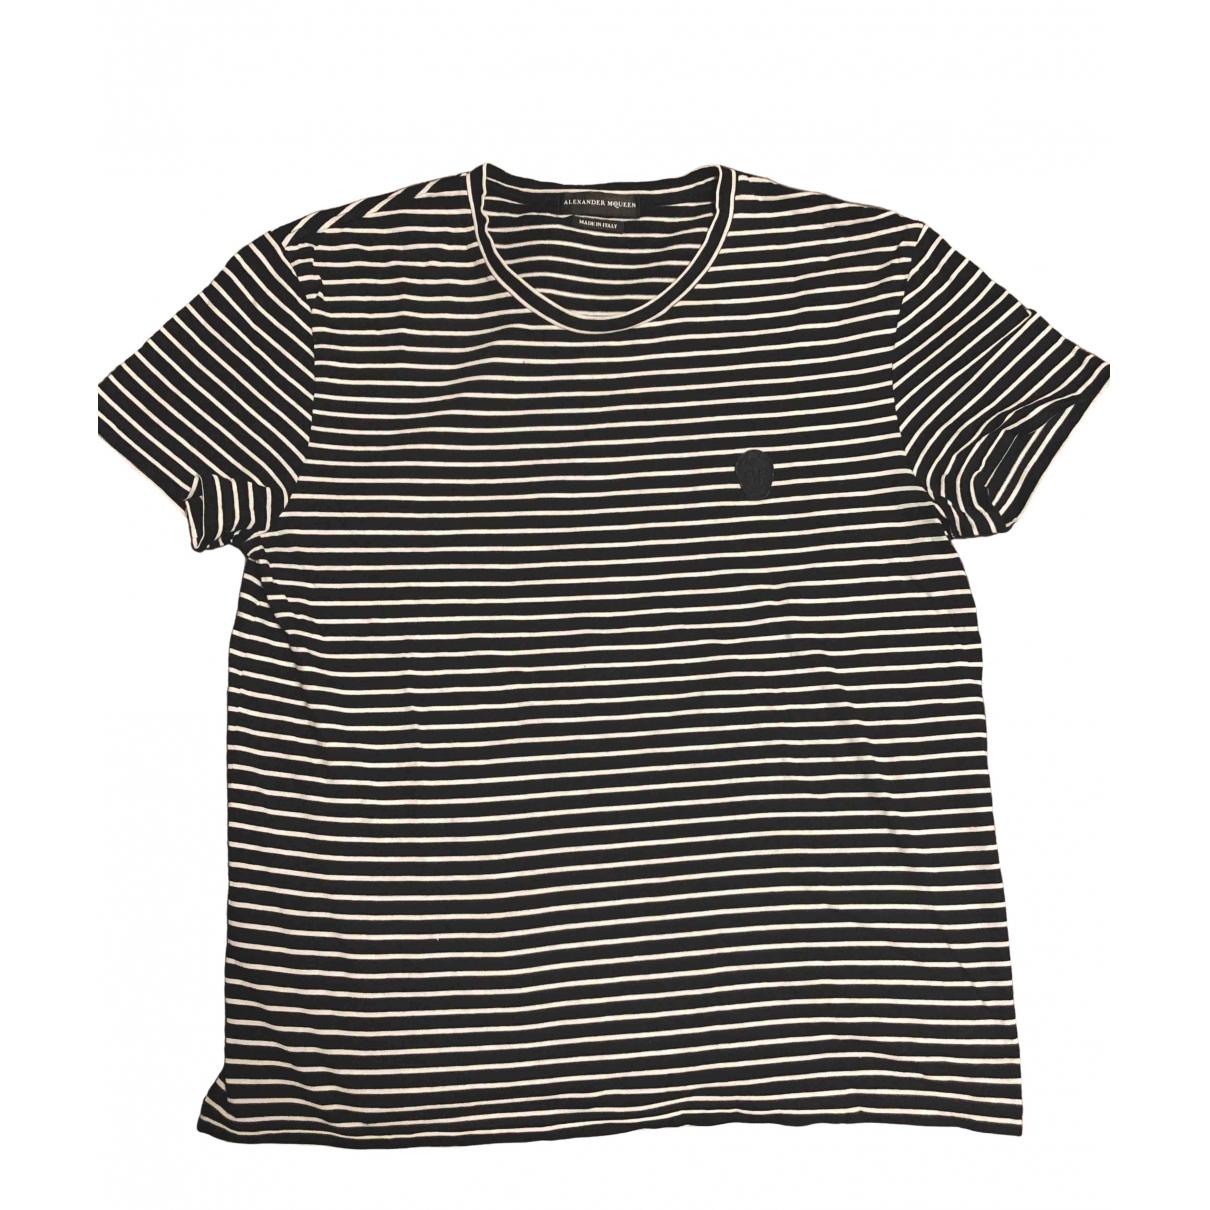 Alexander Mcqueen - Tee shirts   pour homme en coton - noir